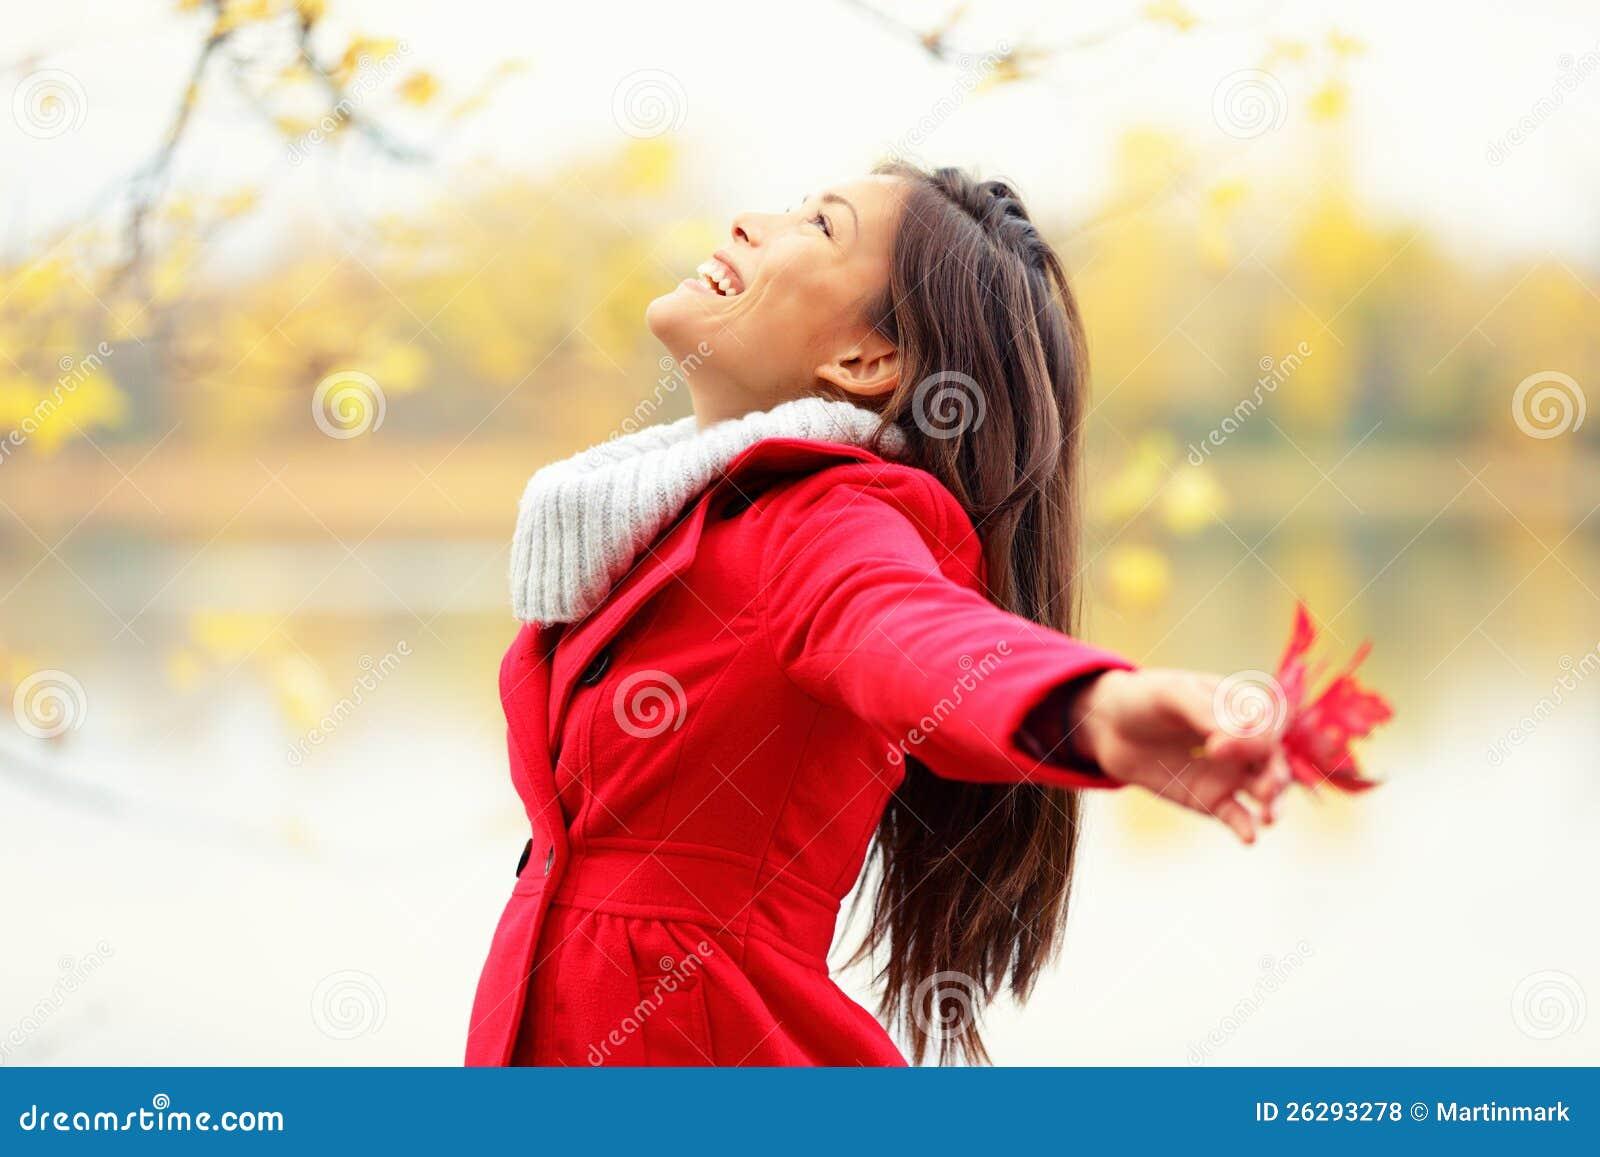 happy-autumn-woman-blissful-26293278.jpg